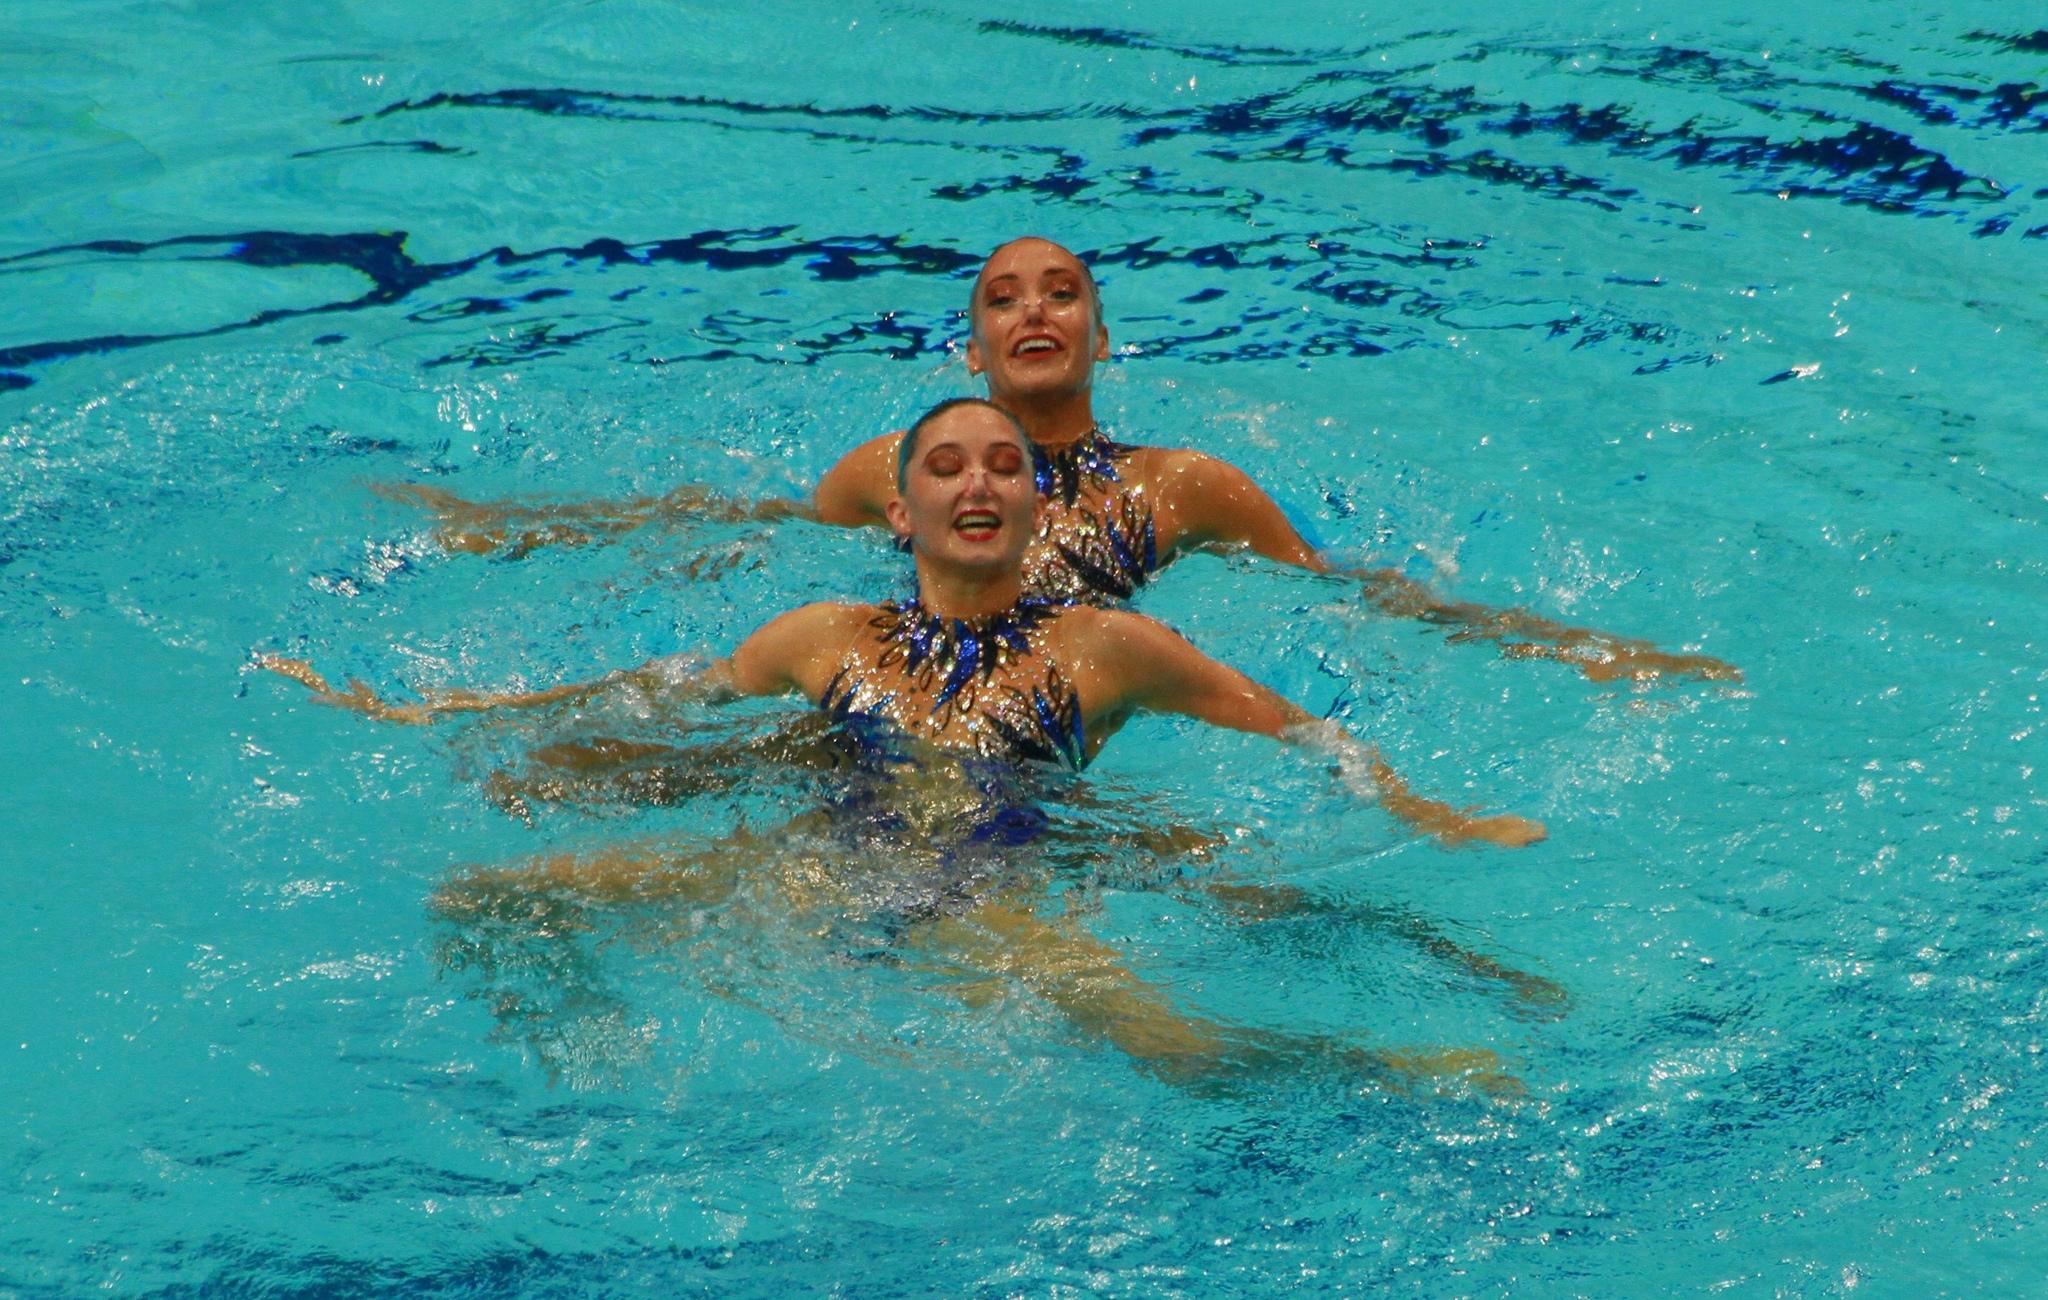 546929742_GreatBritainSynchronisedSwimming13_122_344lo.jpg